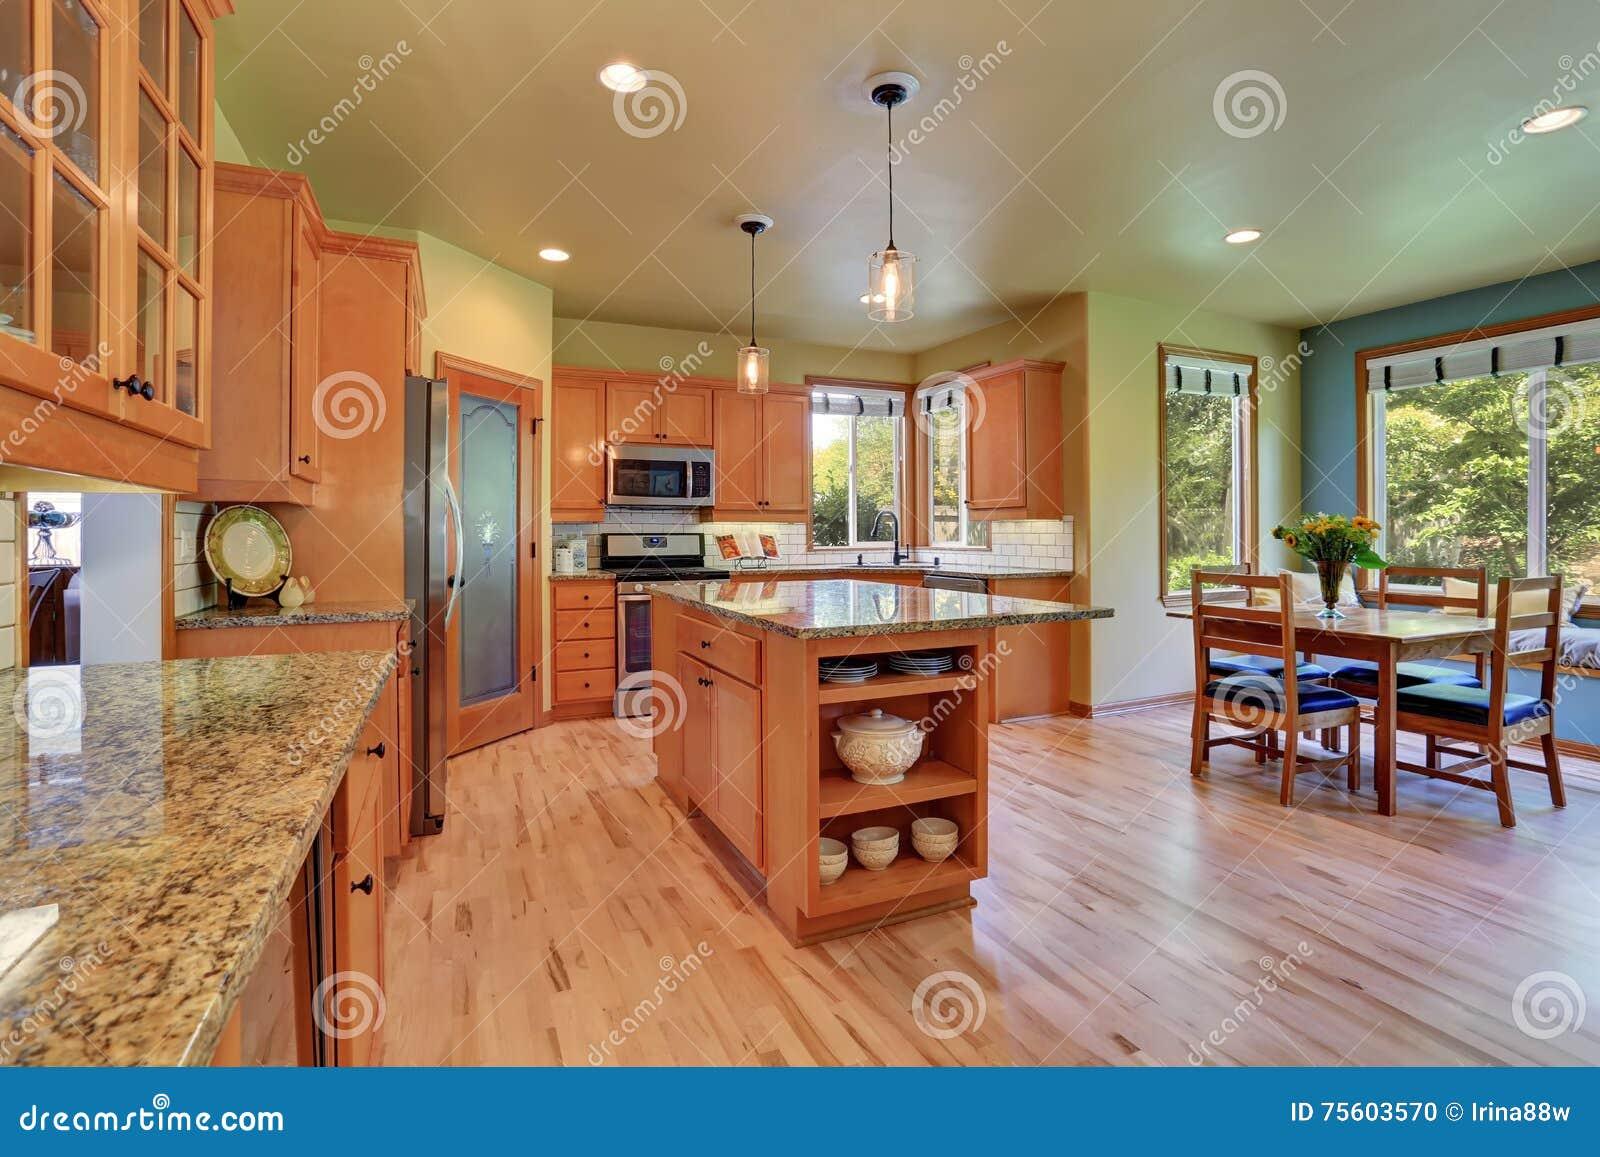 Magnífico Mesa De Cocina Con Cabina De Almacenamiento Adorno - Ideas ...